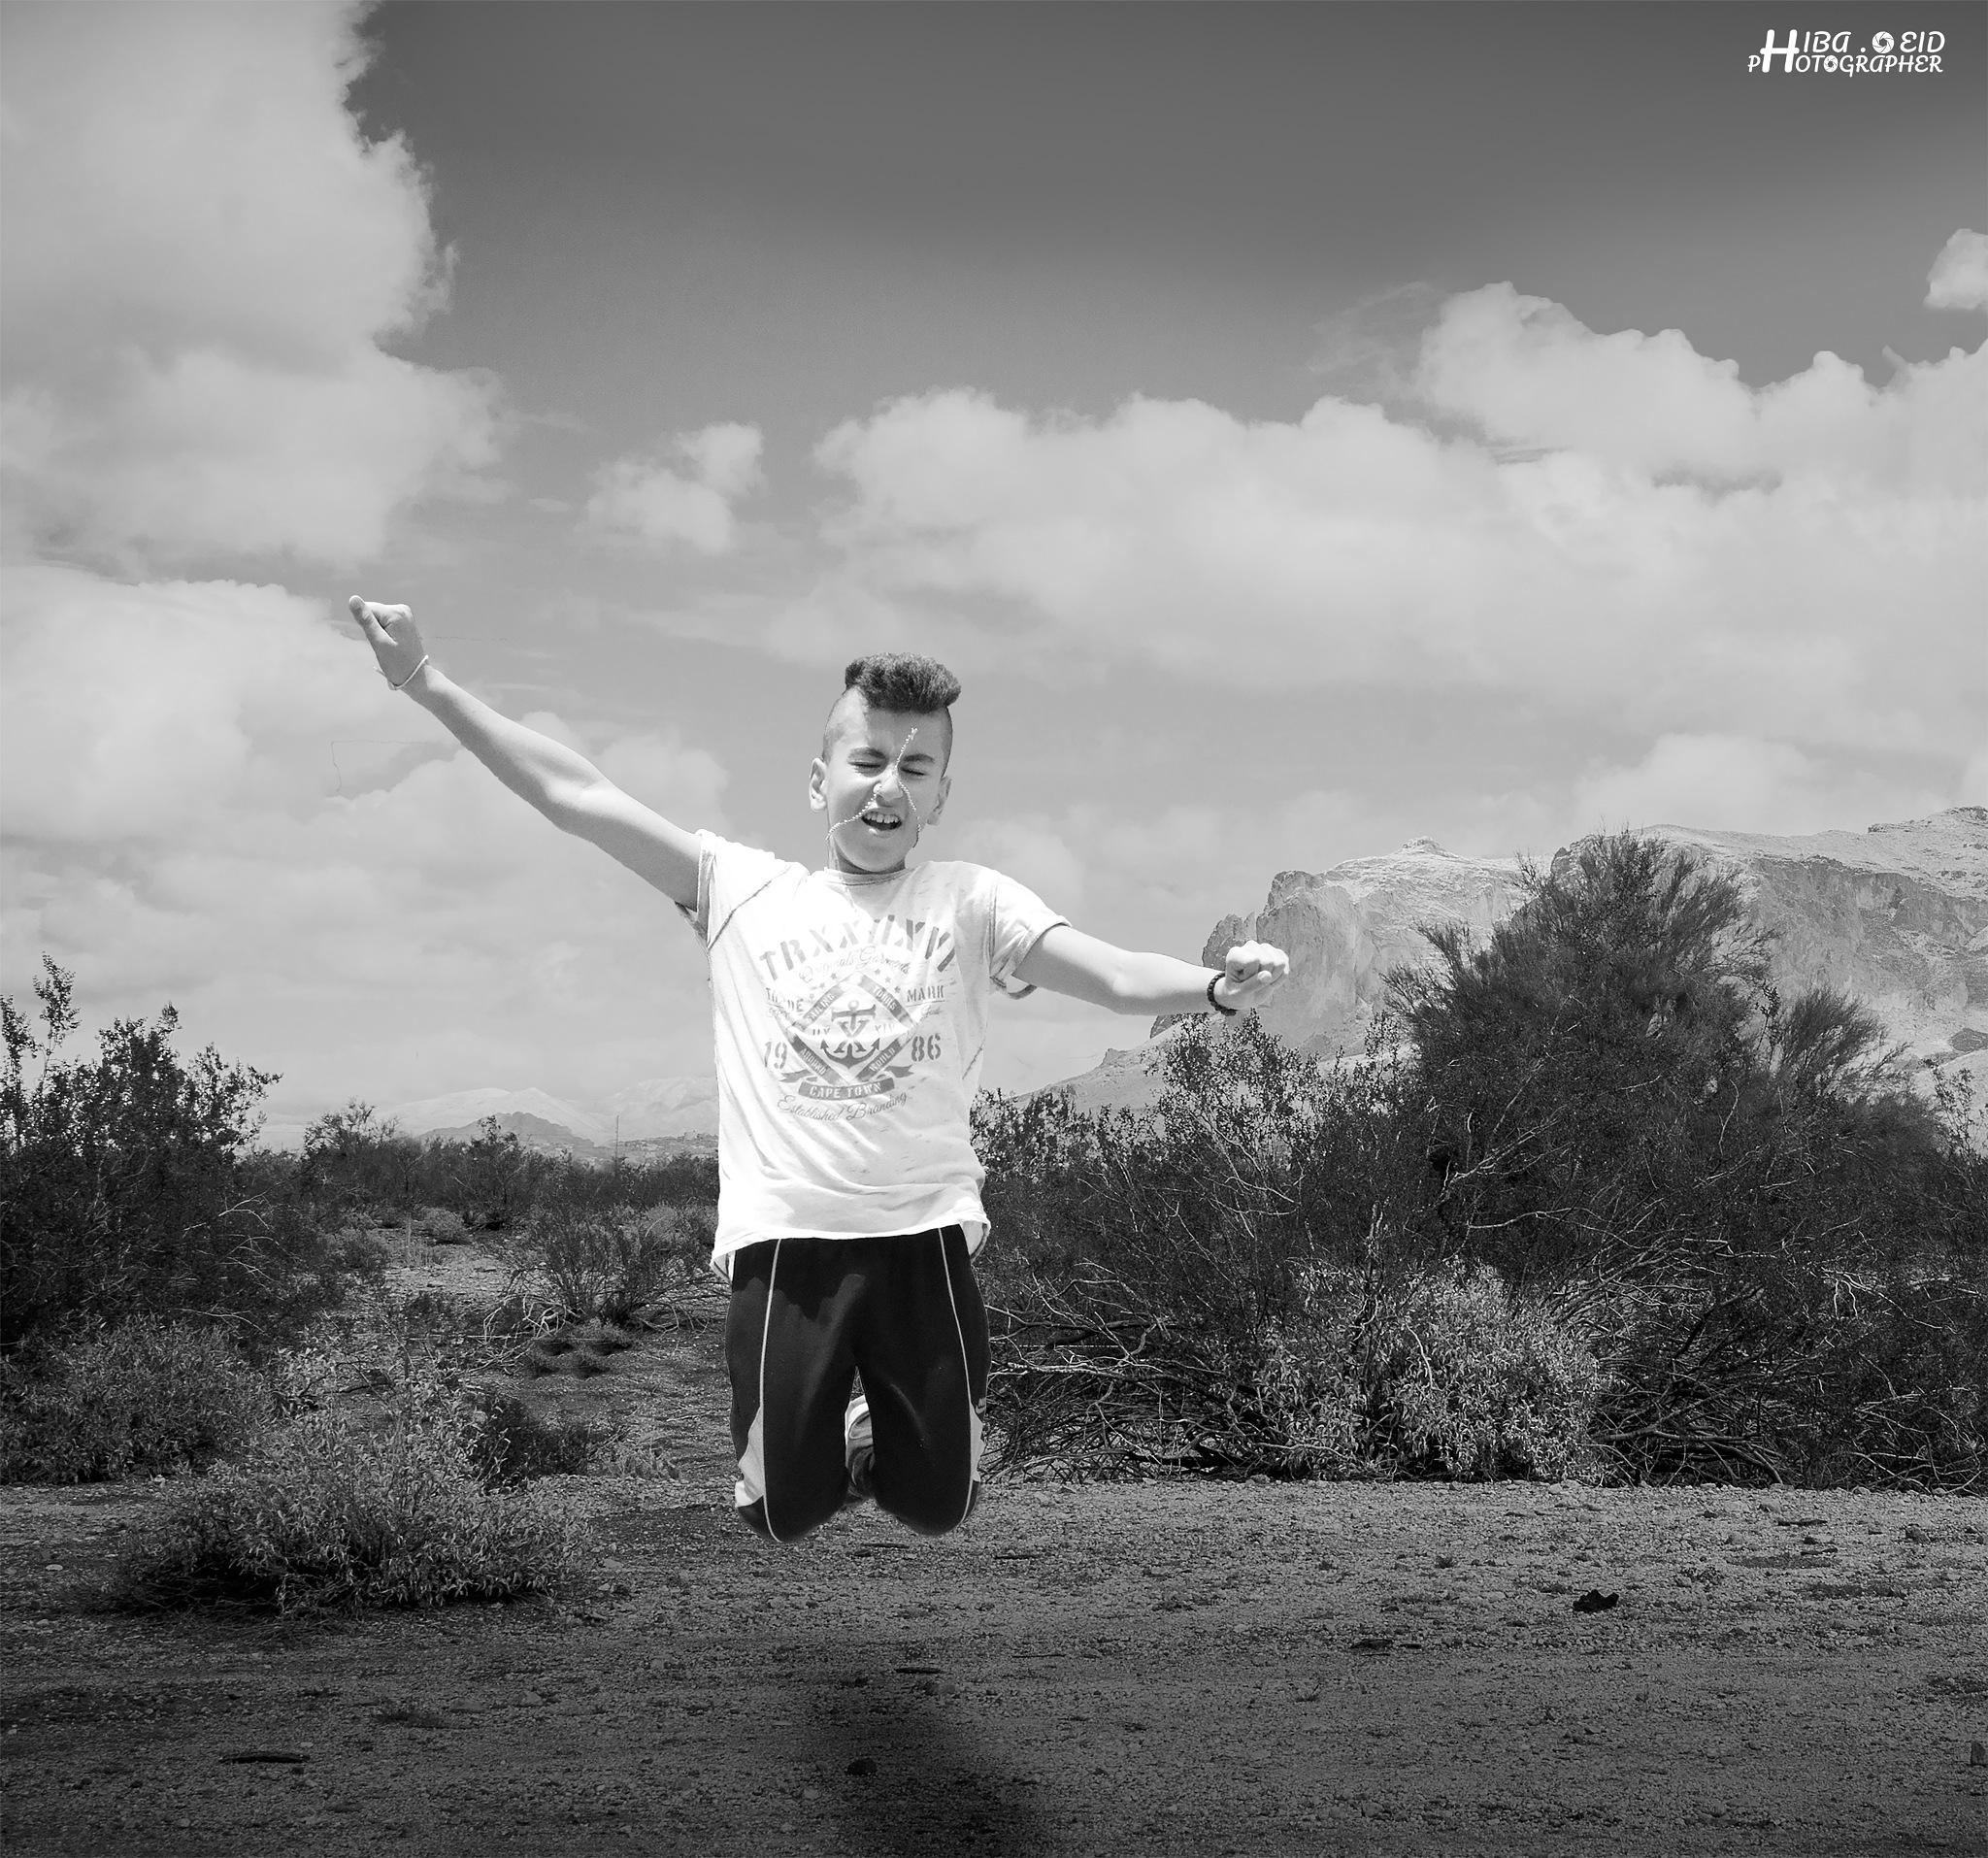 jumping  by Hiba Eid